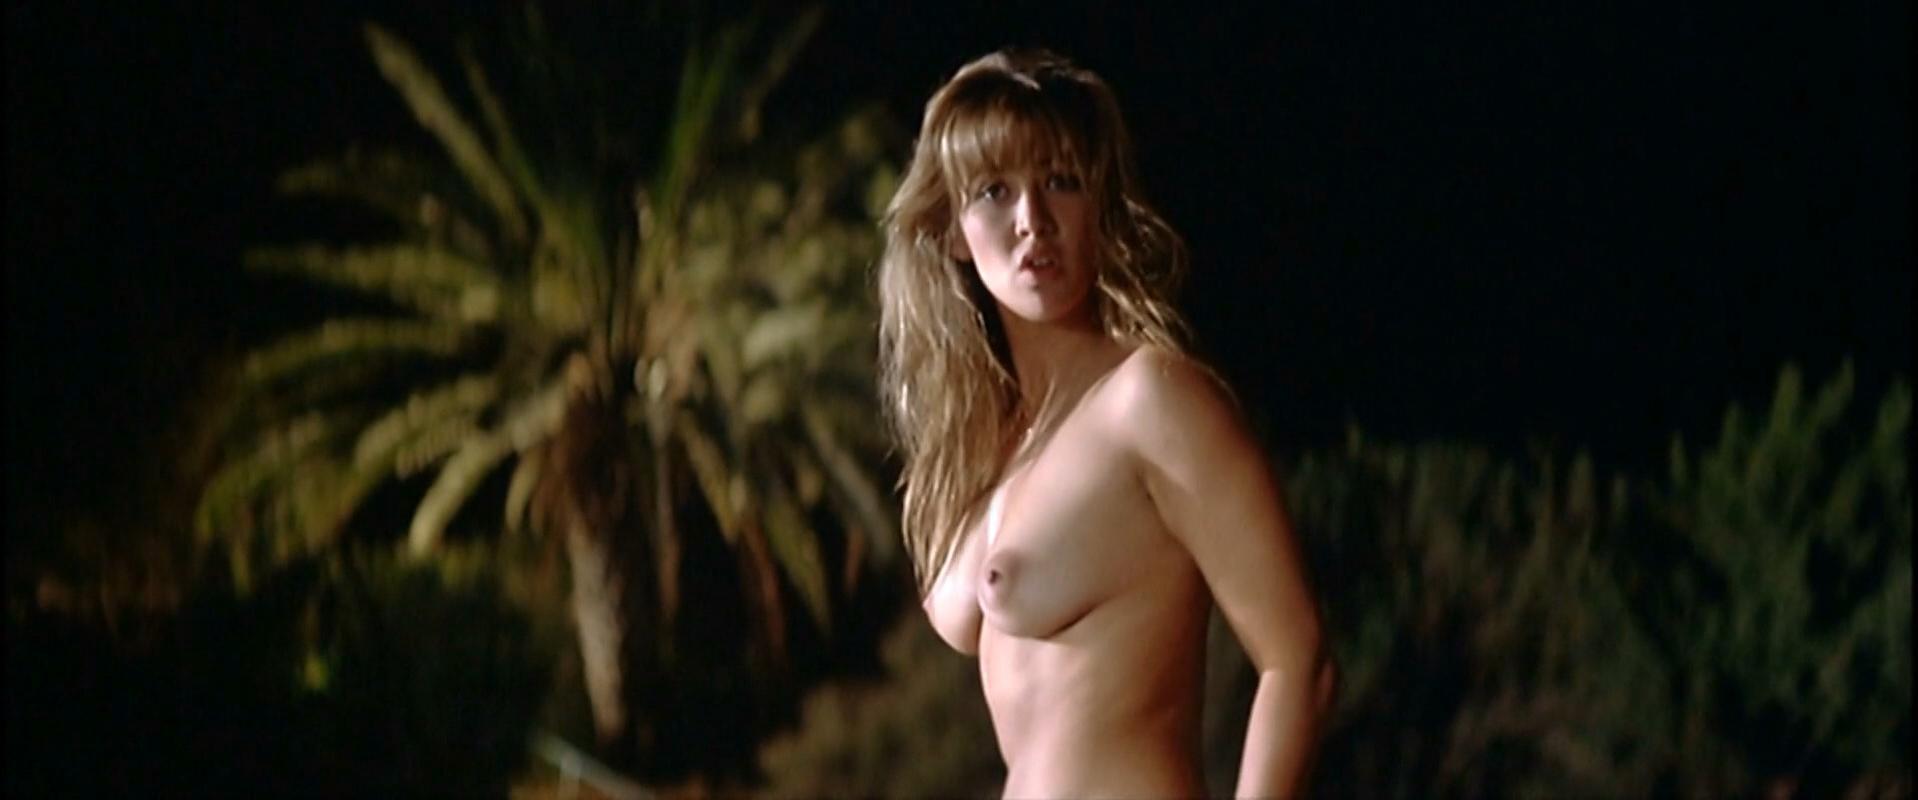 Final, sorry, sophie marceau sex photo apologise